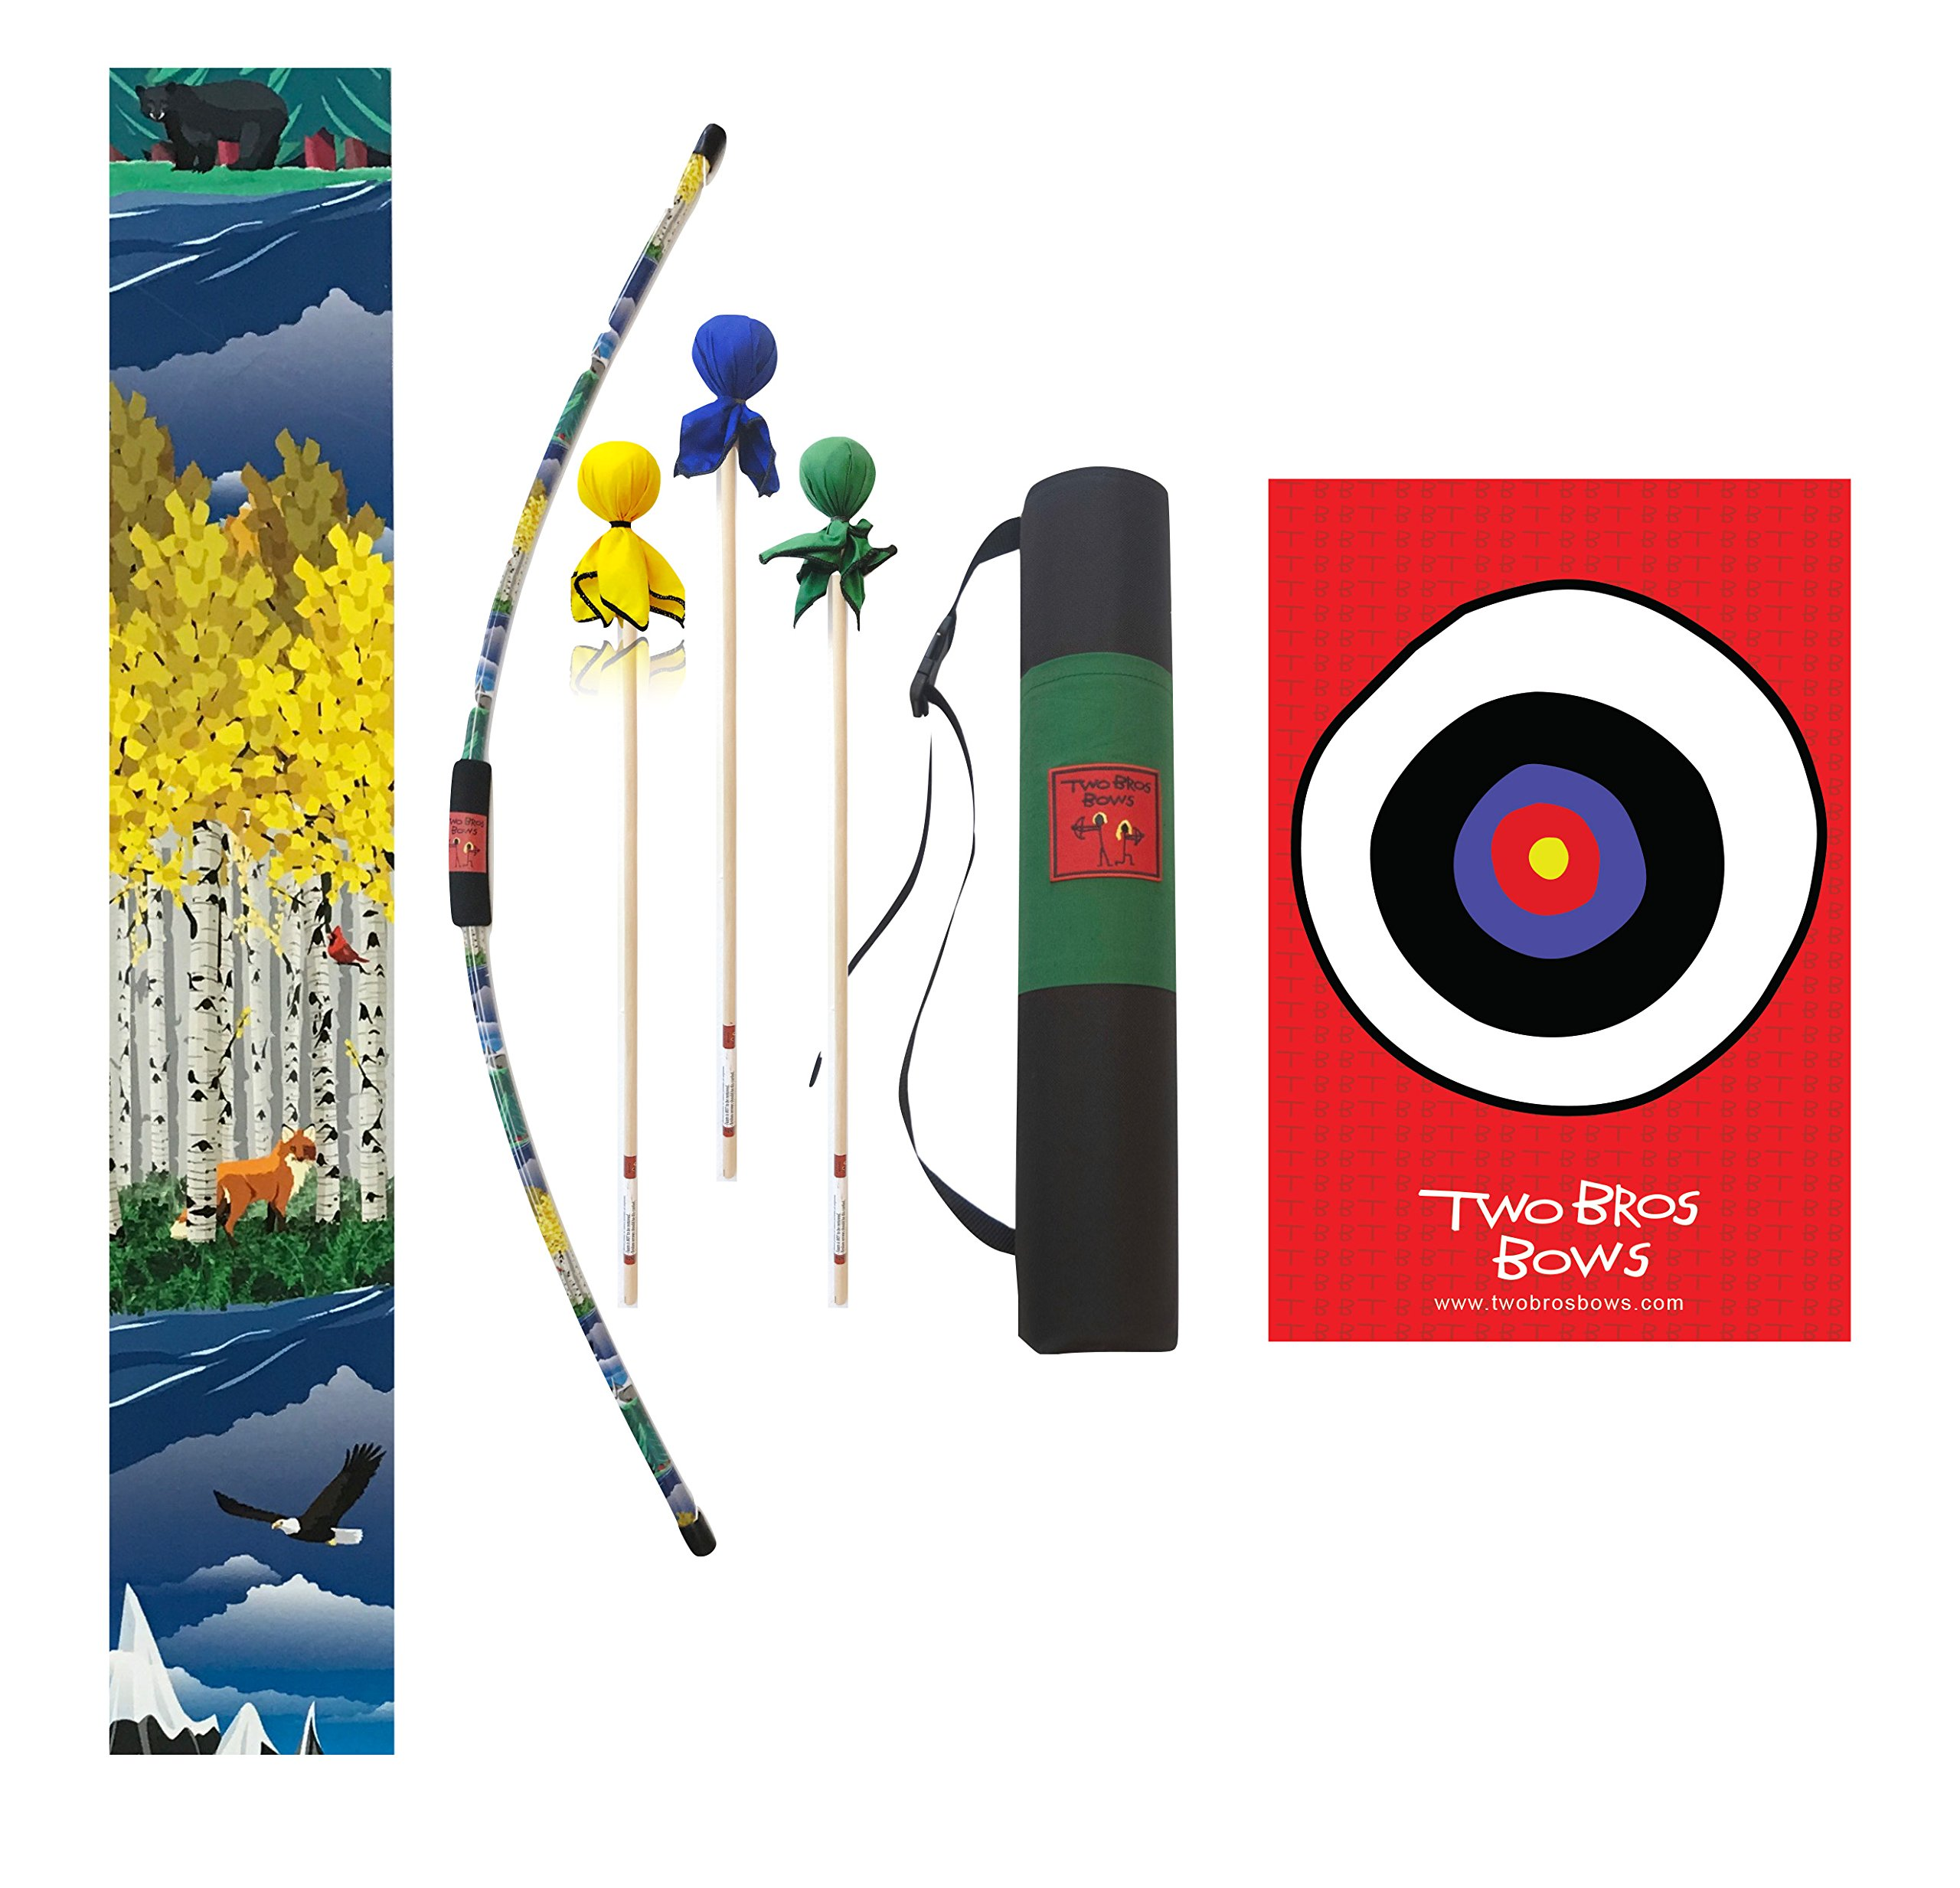 Two Bros Bows Wildlife Archery Combo Set